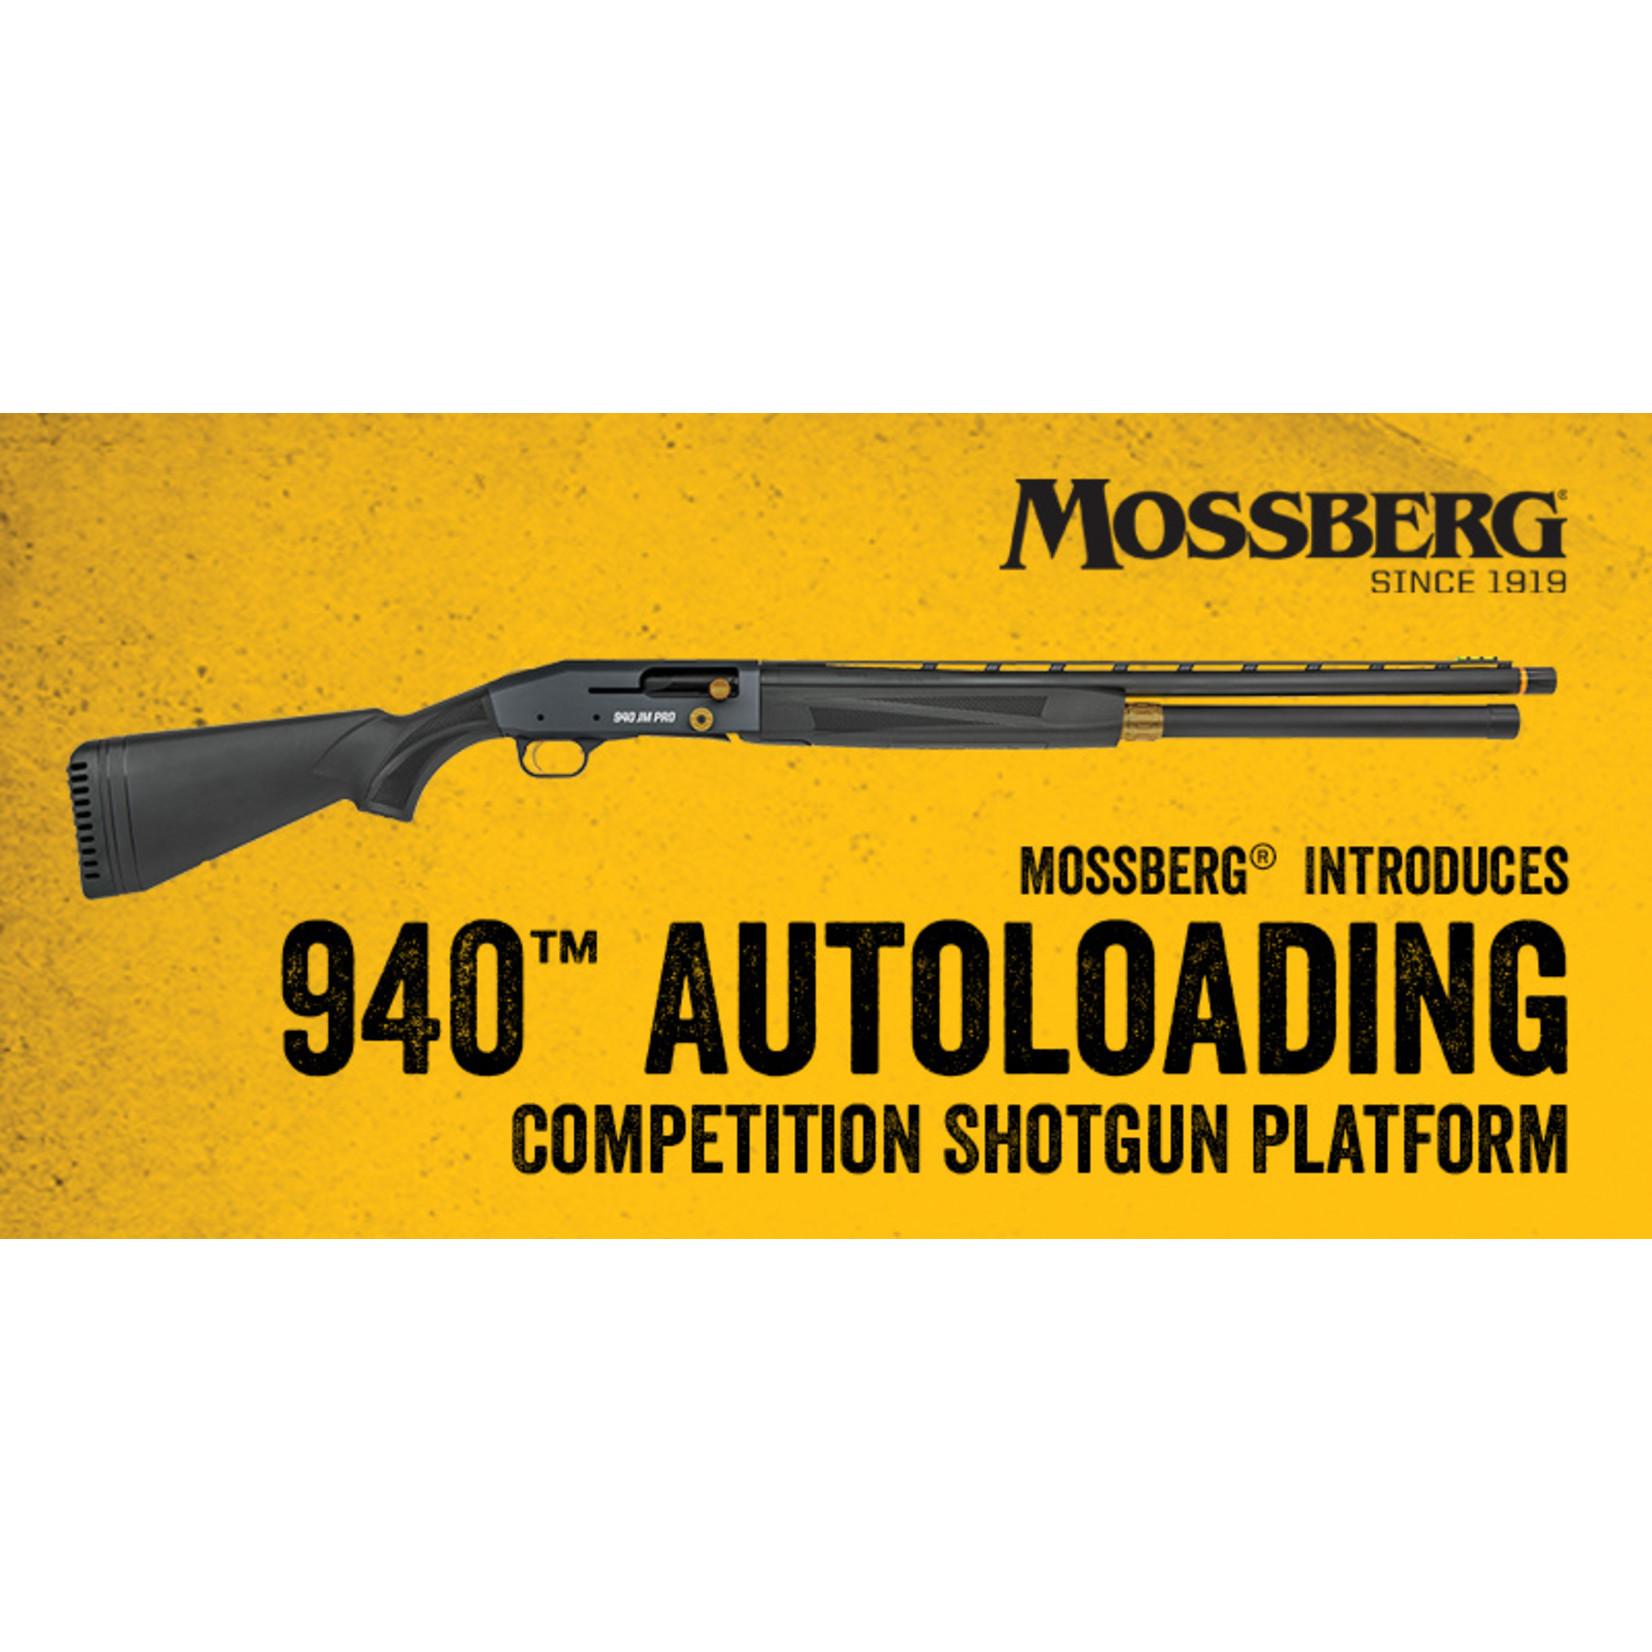 Mossberg Mossberg 940 Jm Pro 12Ga 3'' 24'' 5+1